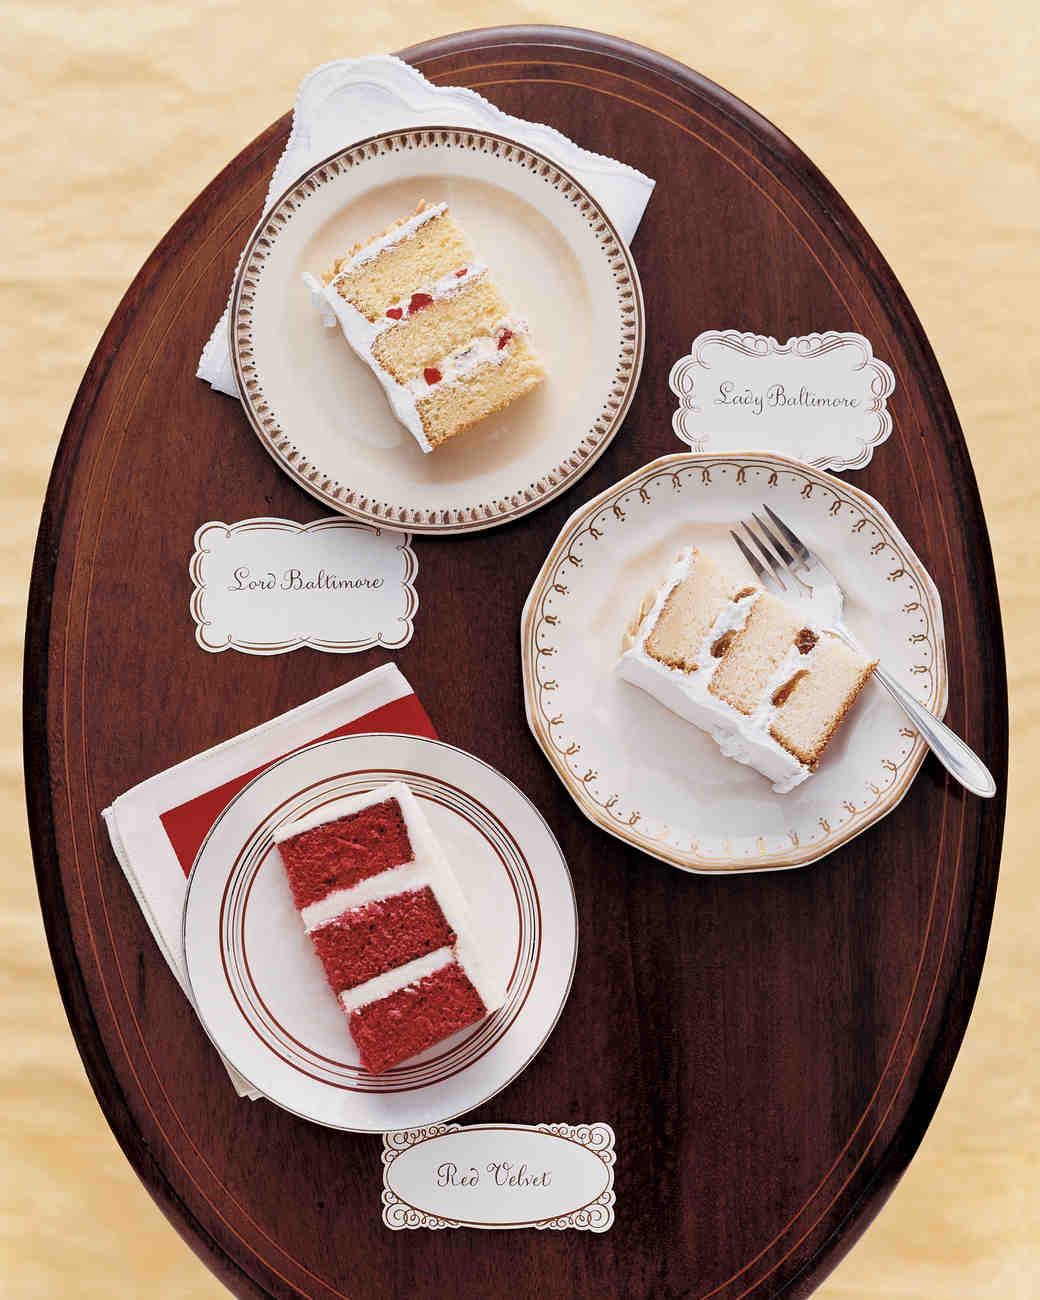 15 Red Velvet Wedding Cakes & Confections | Martha Stewart ...